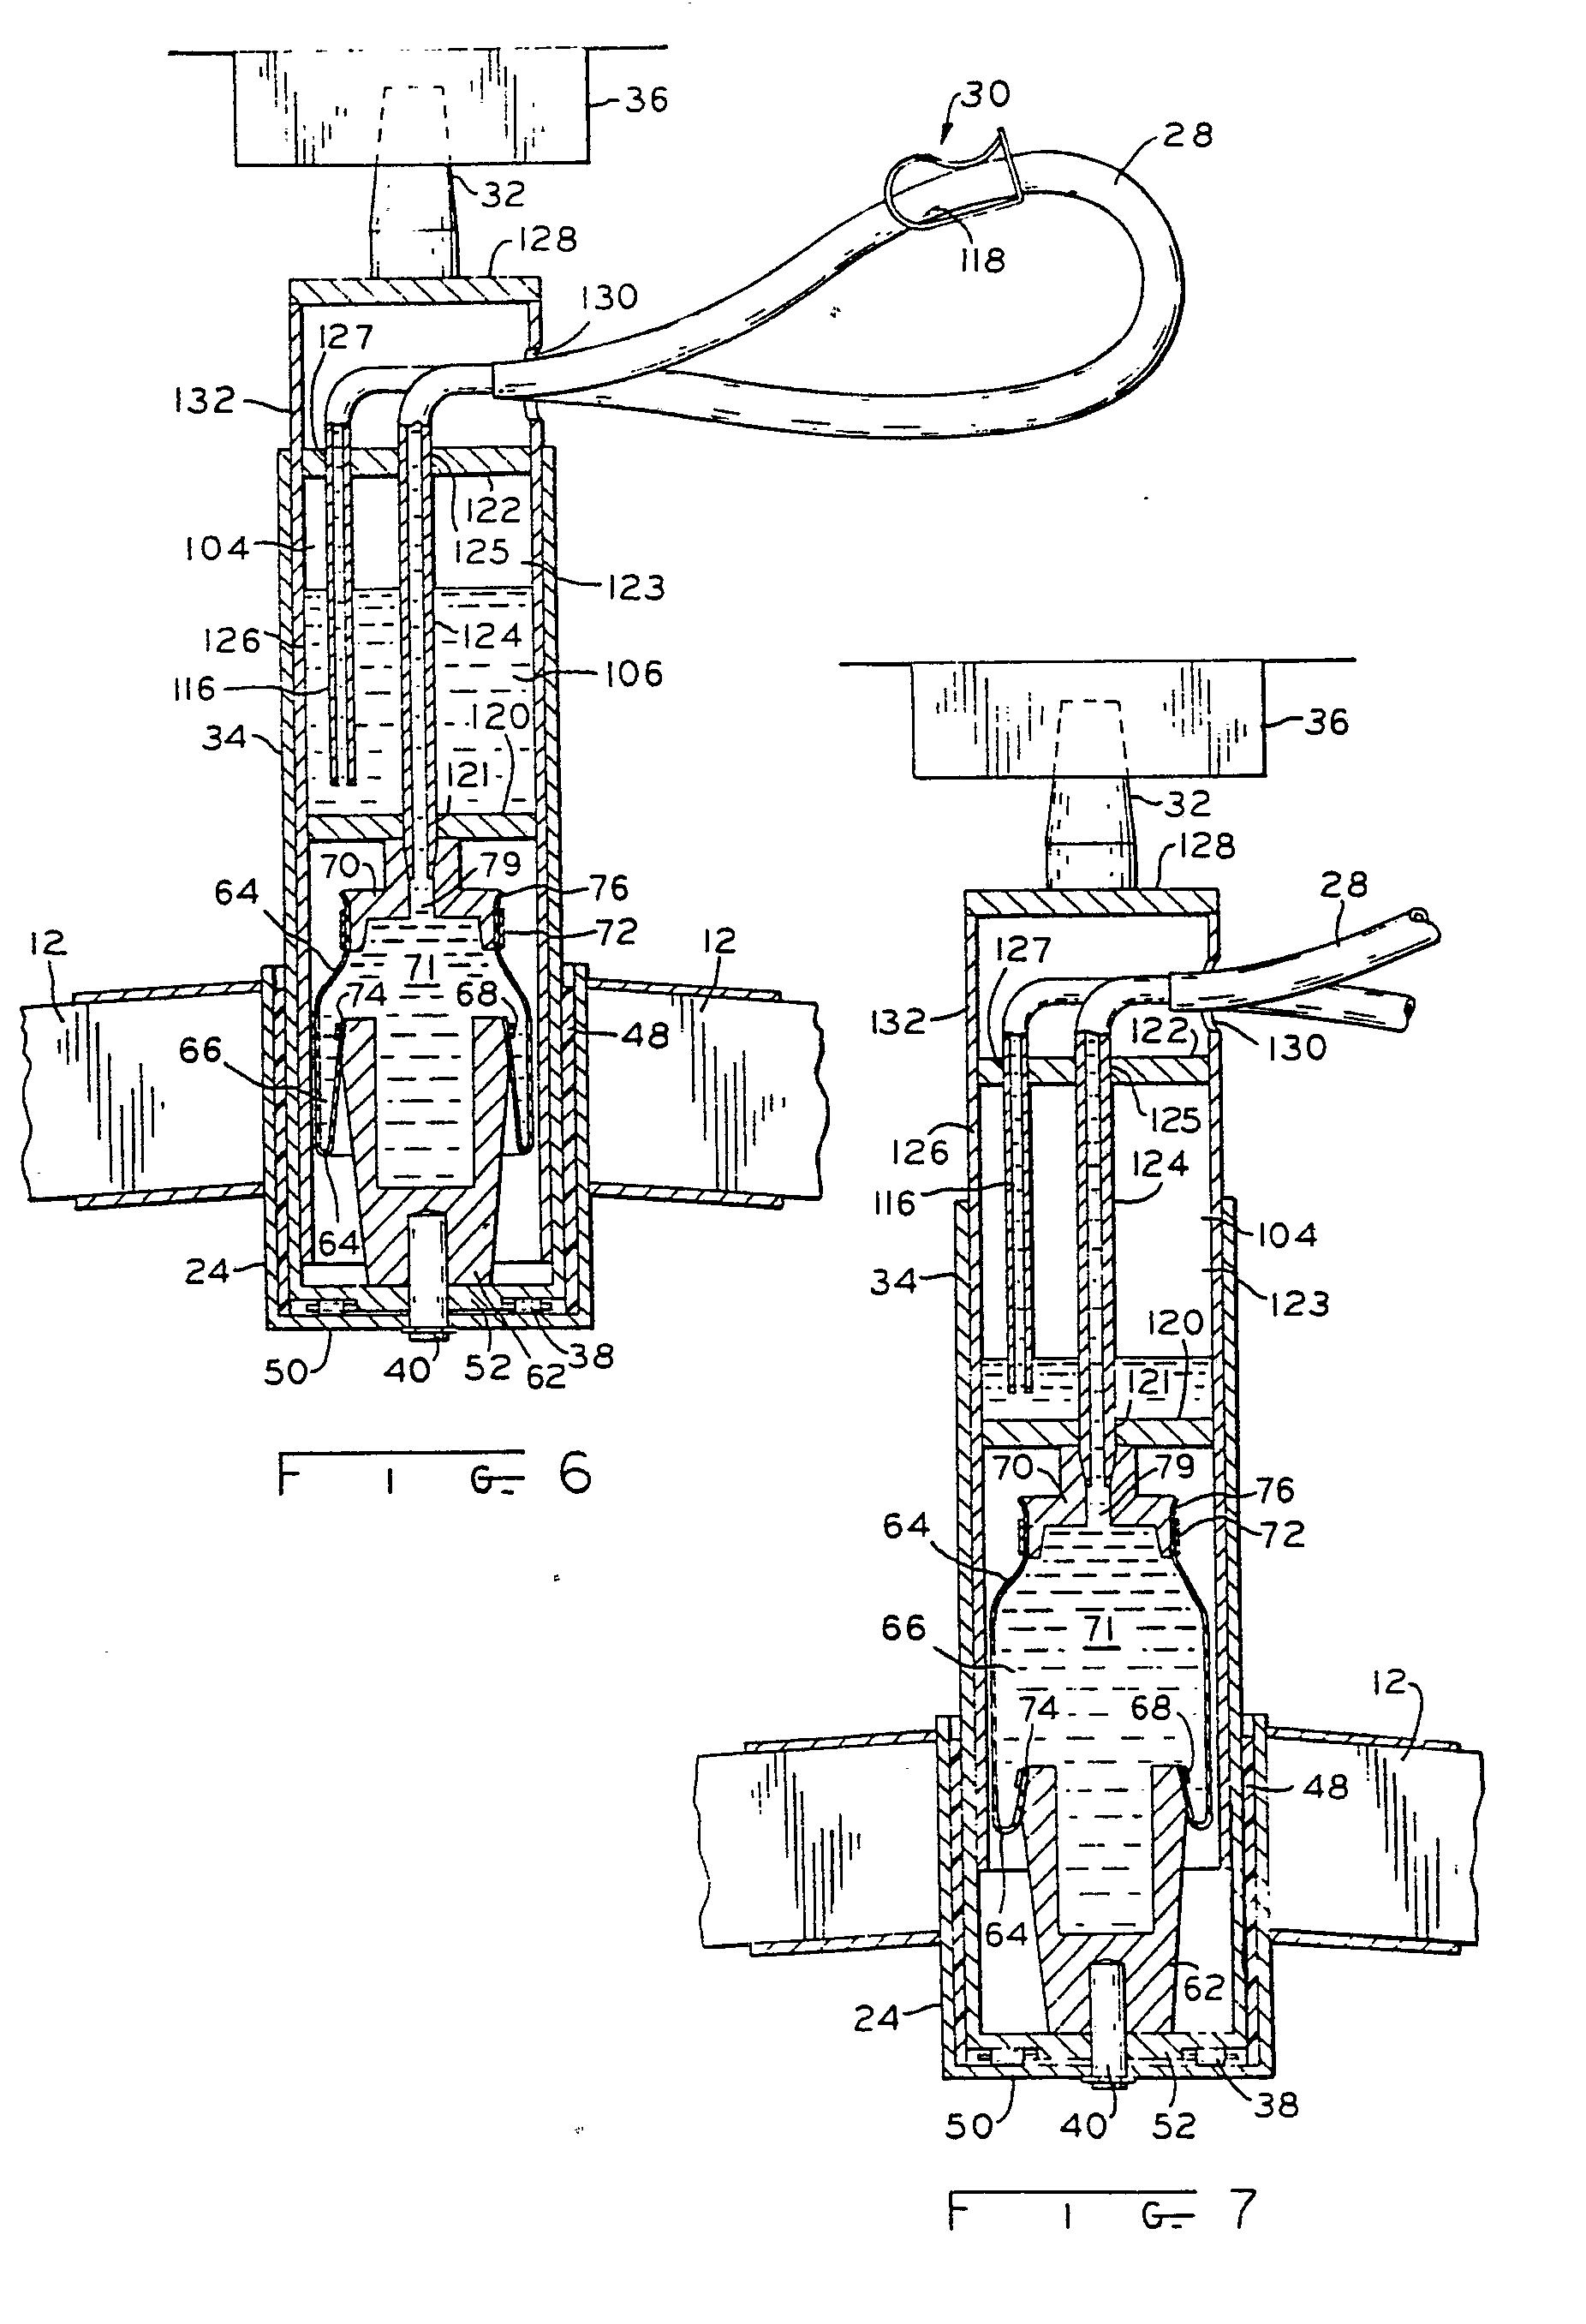 Seat Lift Mechanism : Patent ep b hydraulic chair lift mechanism